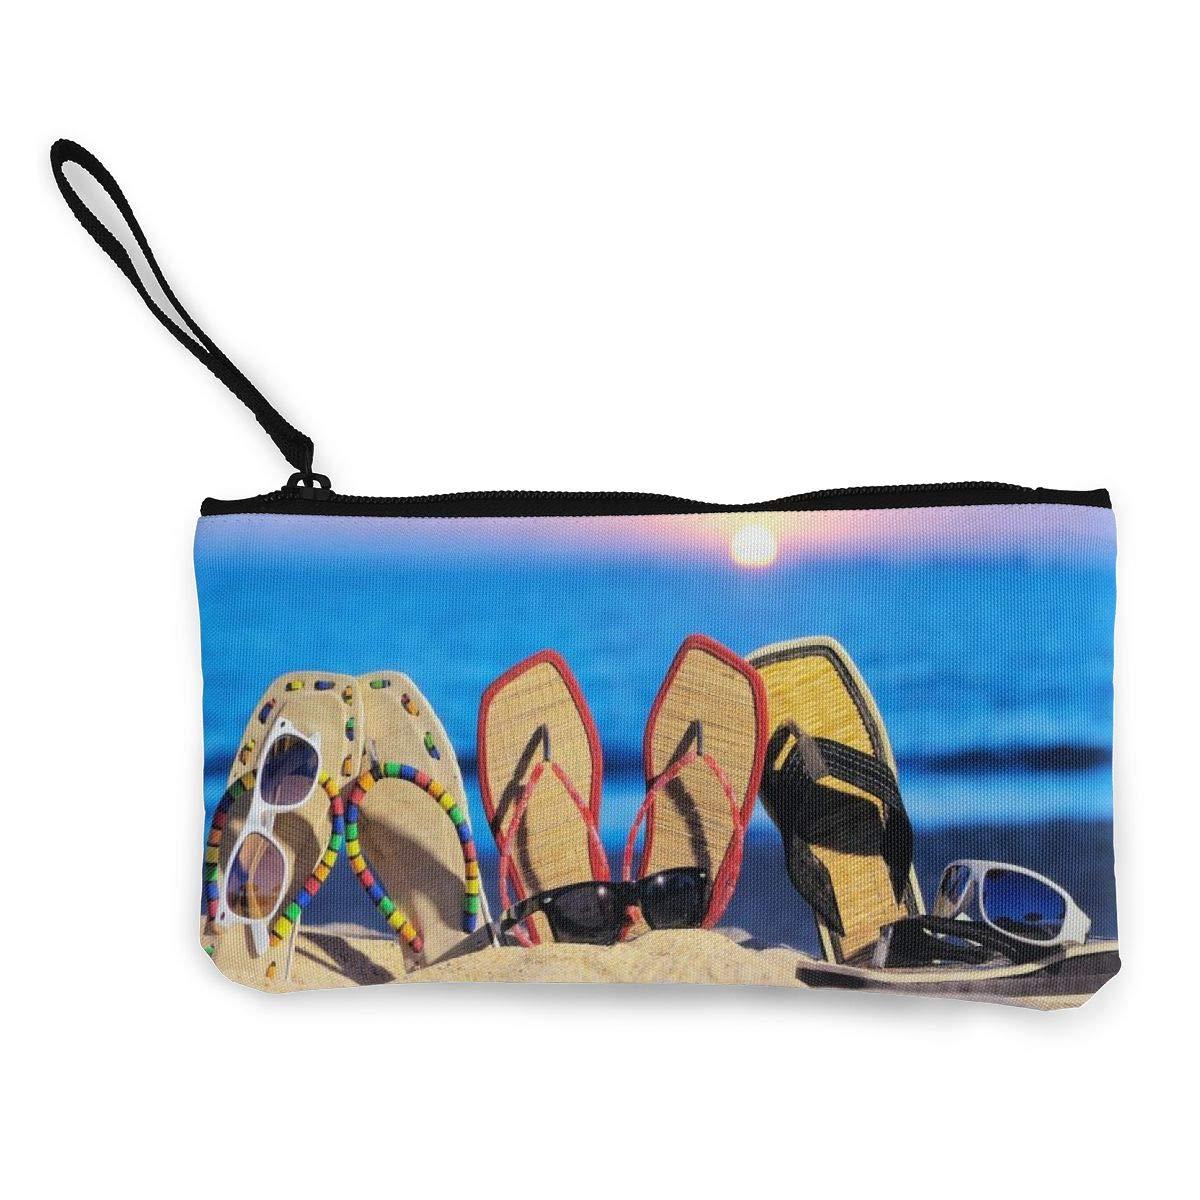 Coin Pouch Sun Sand Flip Flops Canvas Coin Purse Cellphone Card Bag With Handle And Zipper